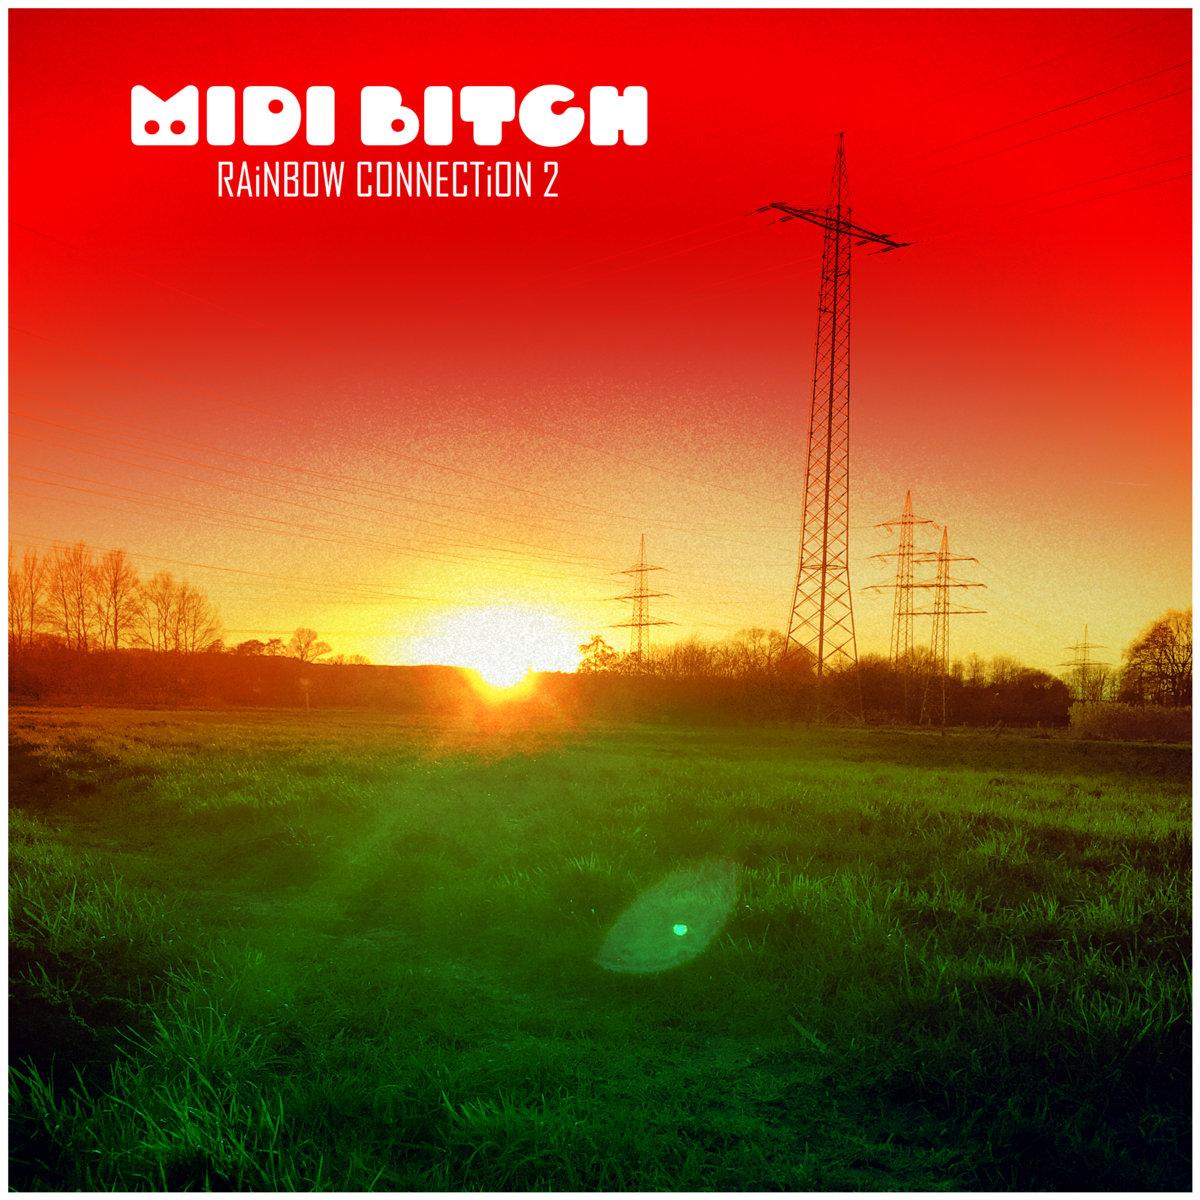 MiDi BiTCH - RAiNBOW CONNECTiON 2